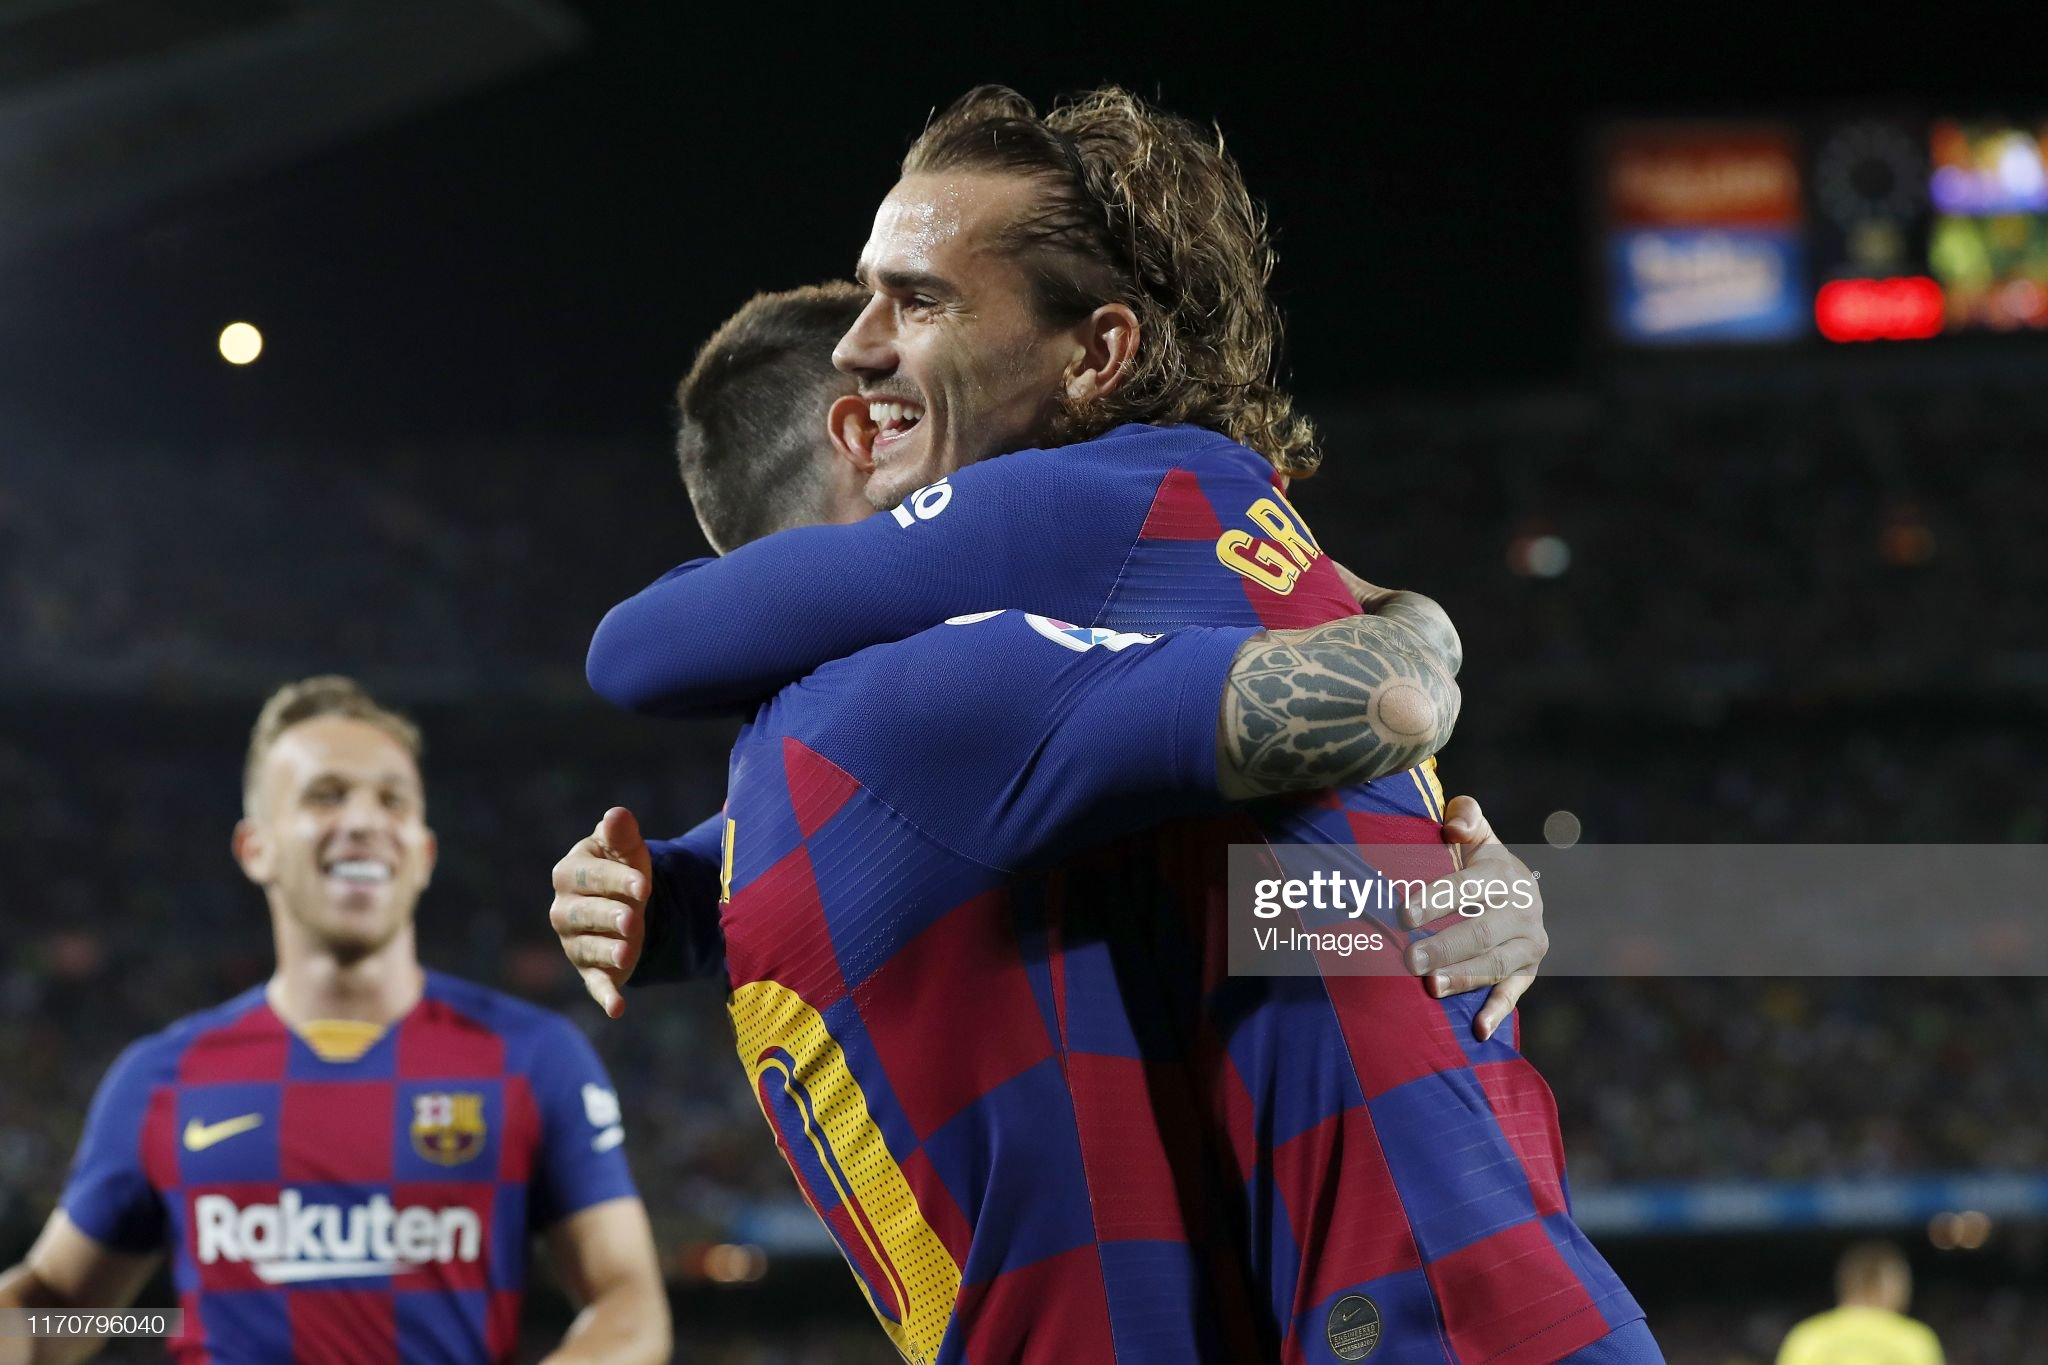 صور مباراة : برشلونة - فياريال 2-1 ( 24-09-2019 )  Lionel-messi-of-fc-barcelona-antoine-griezmann-of-fc-barcelona-during-picture-id1170796040?s=2048x2048